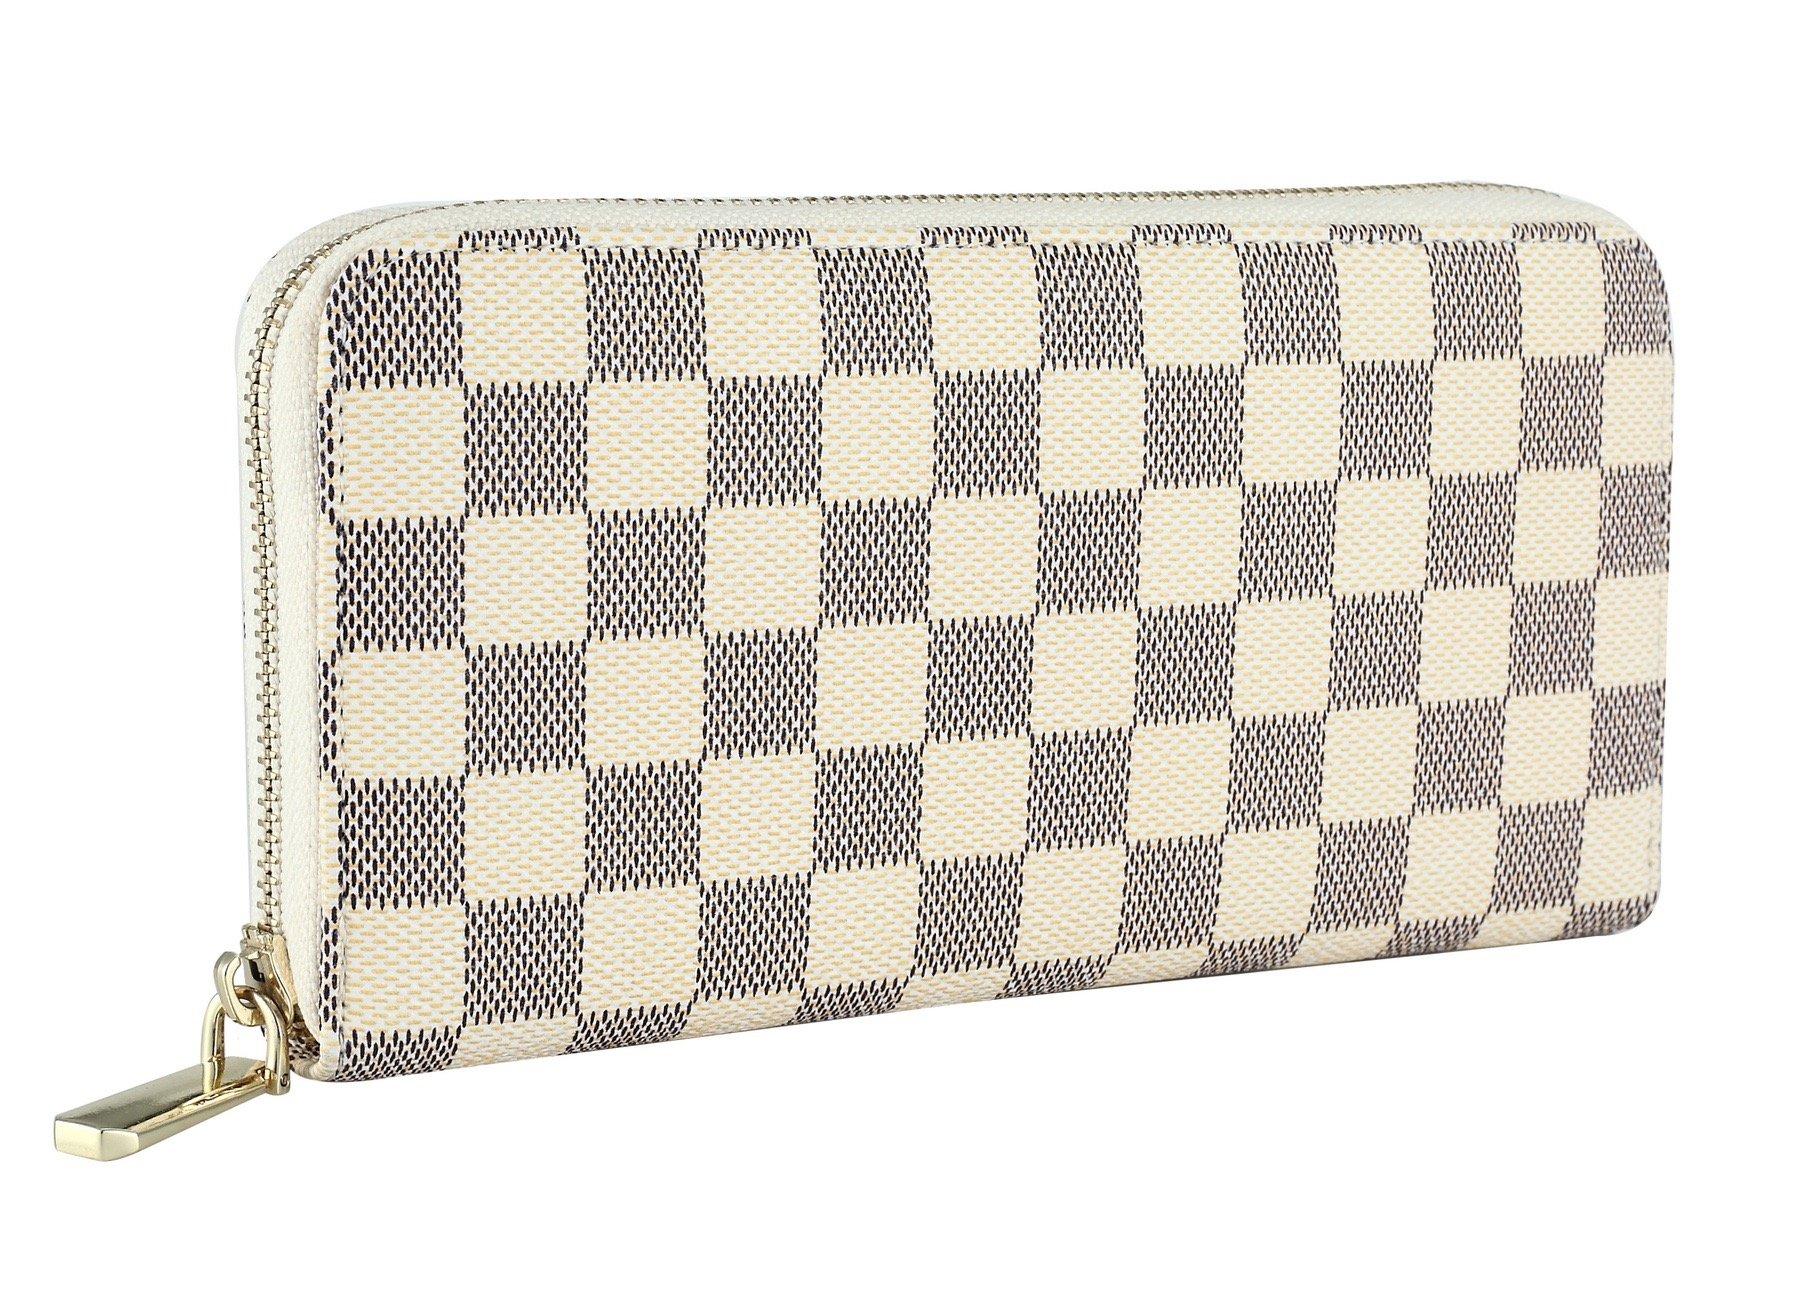 Daisy Rose Women's Wallet on Sale PU Vegan Leather Clutch Handbag RFID Zipper Organizer Card Holder (Cream)